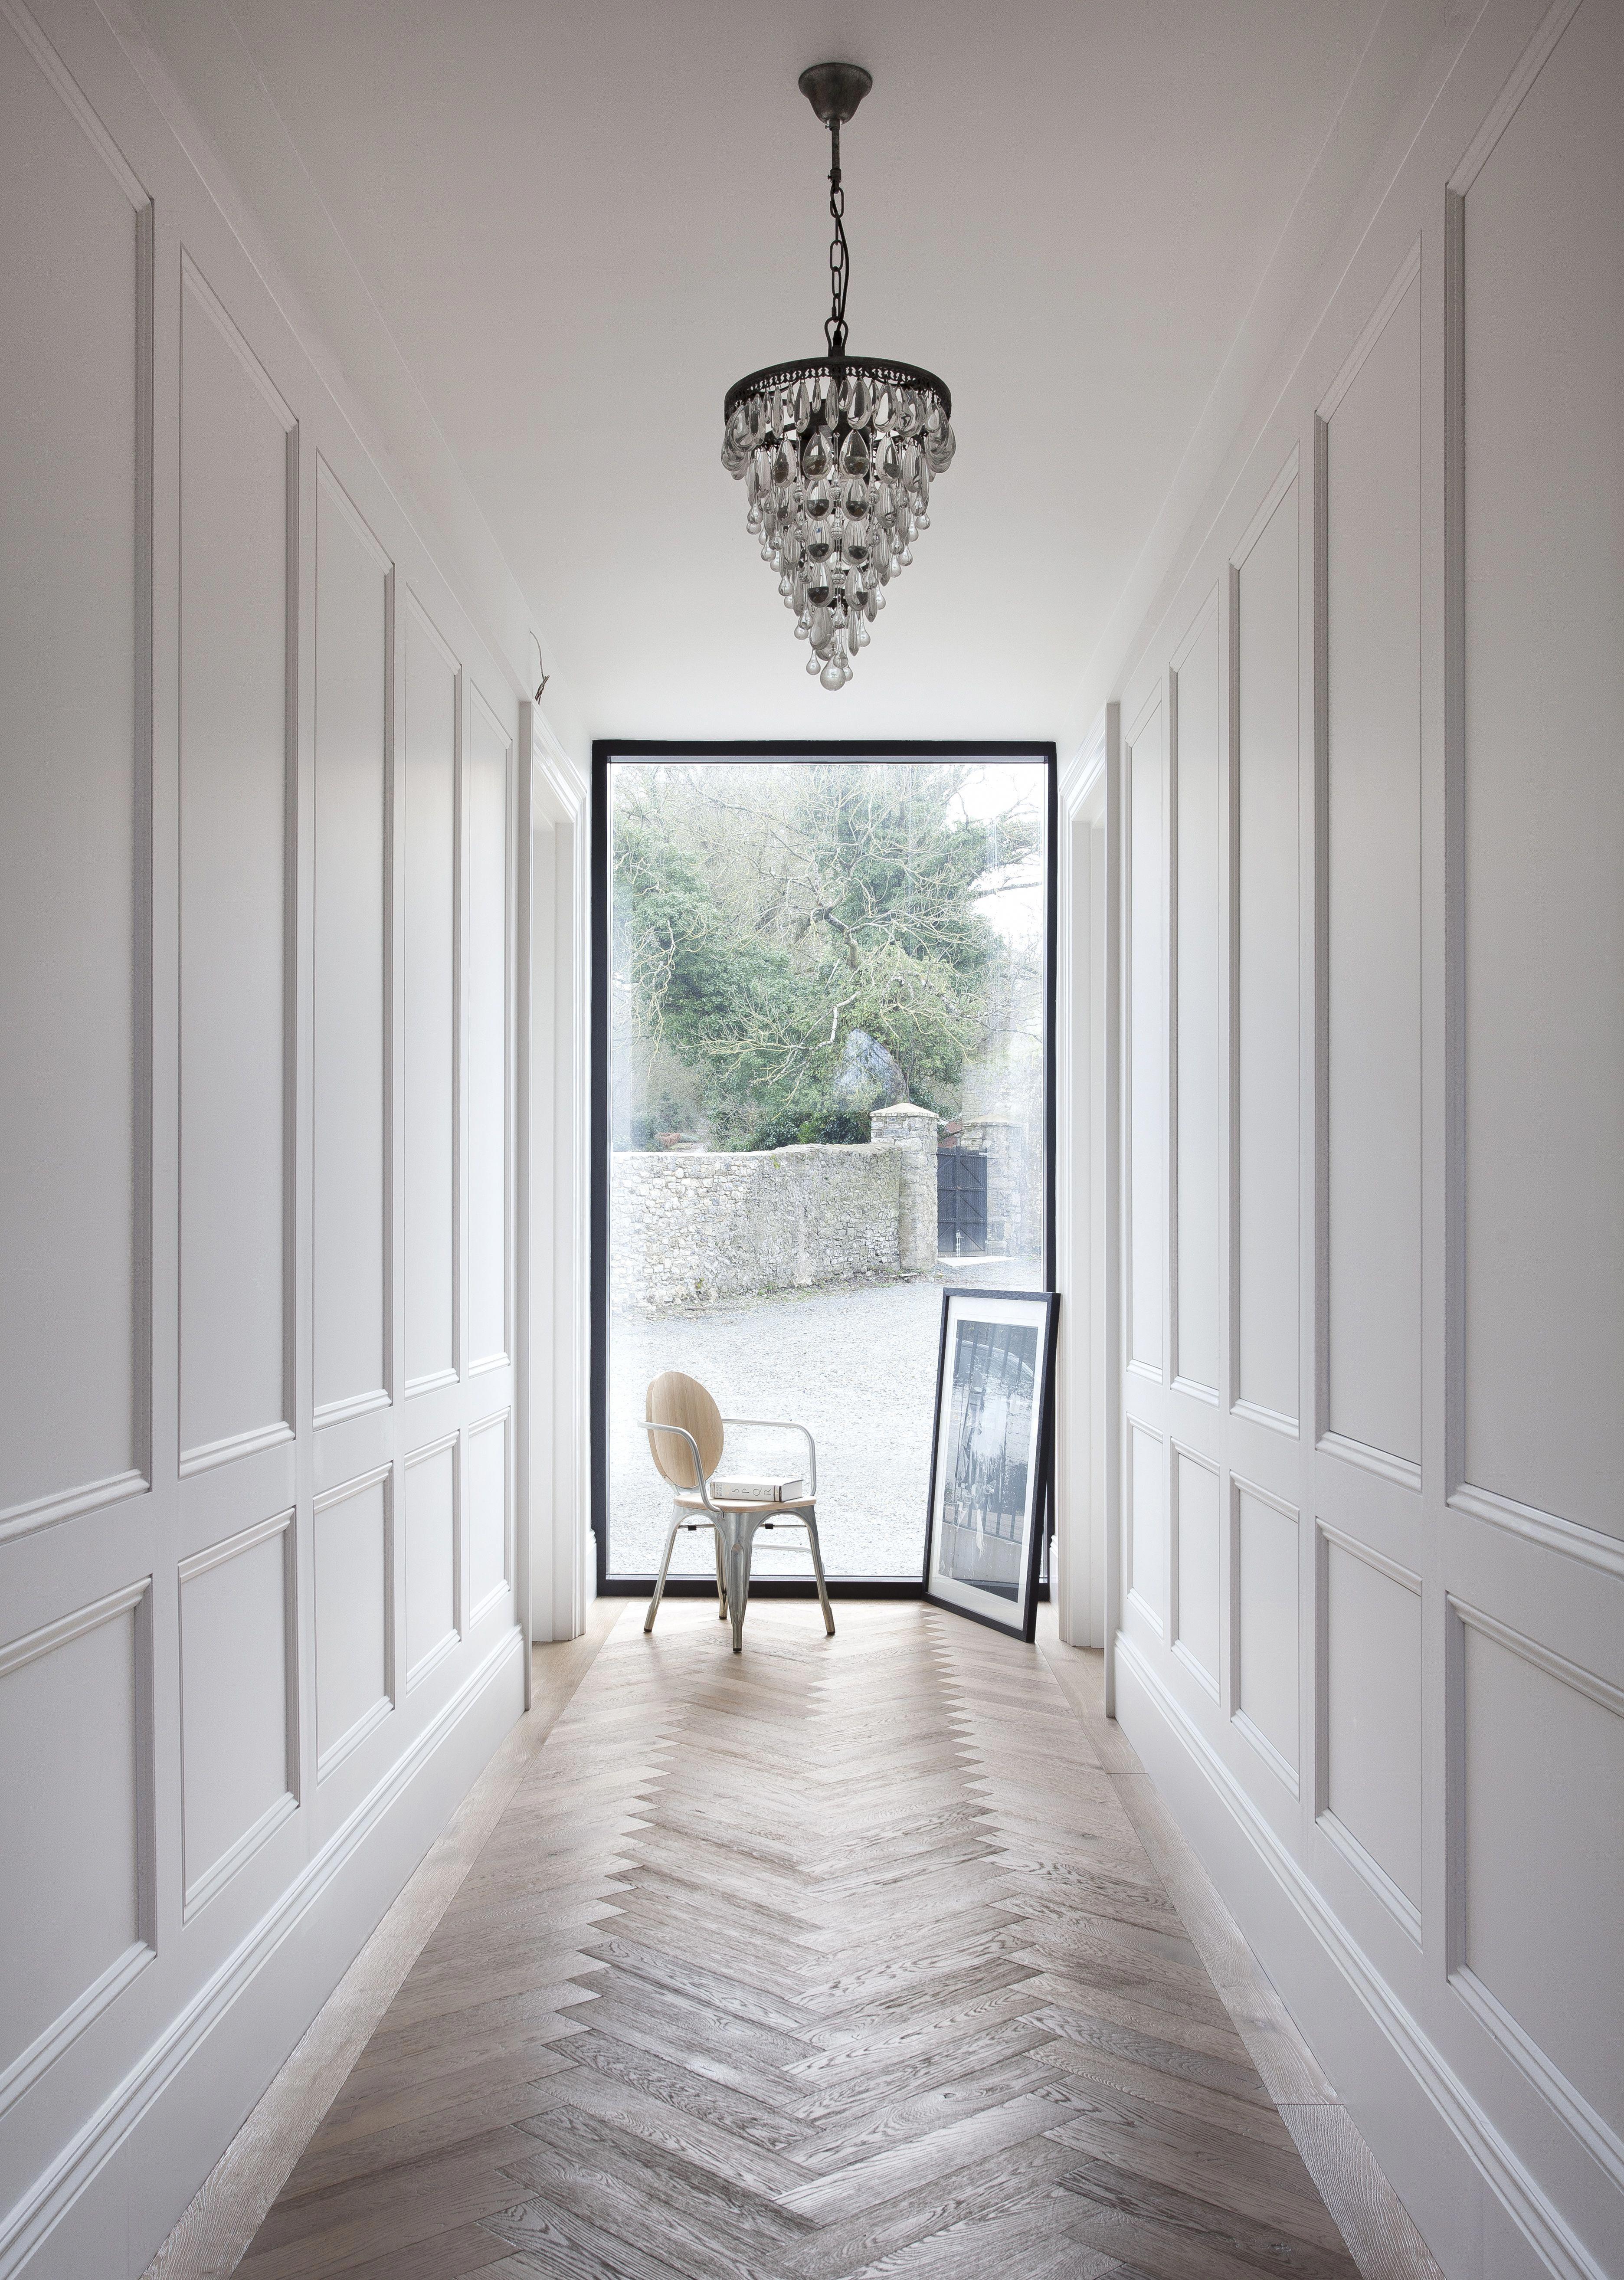 Hallway Lighting ideas modern farmhouse - Spacious entry ...